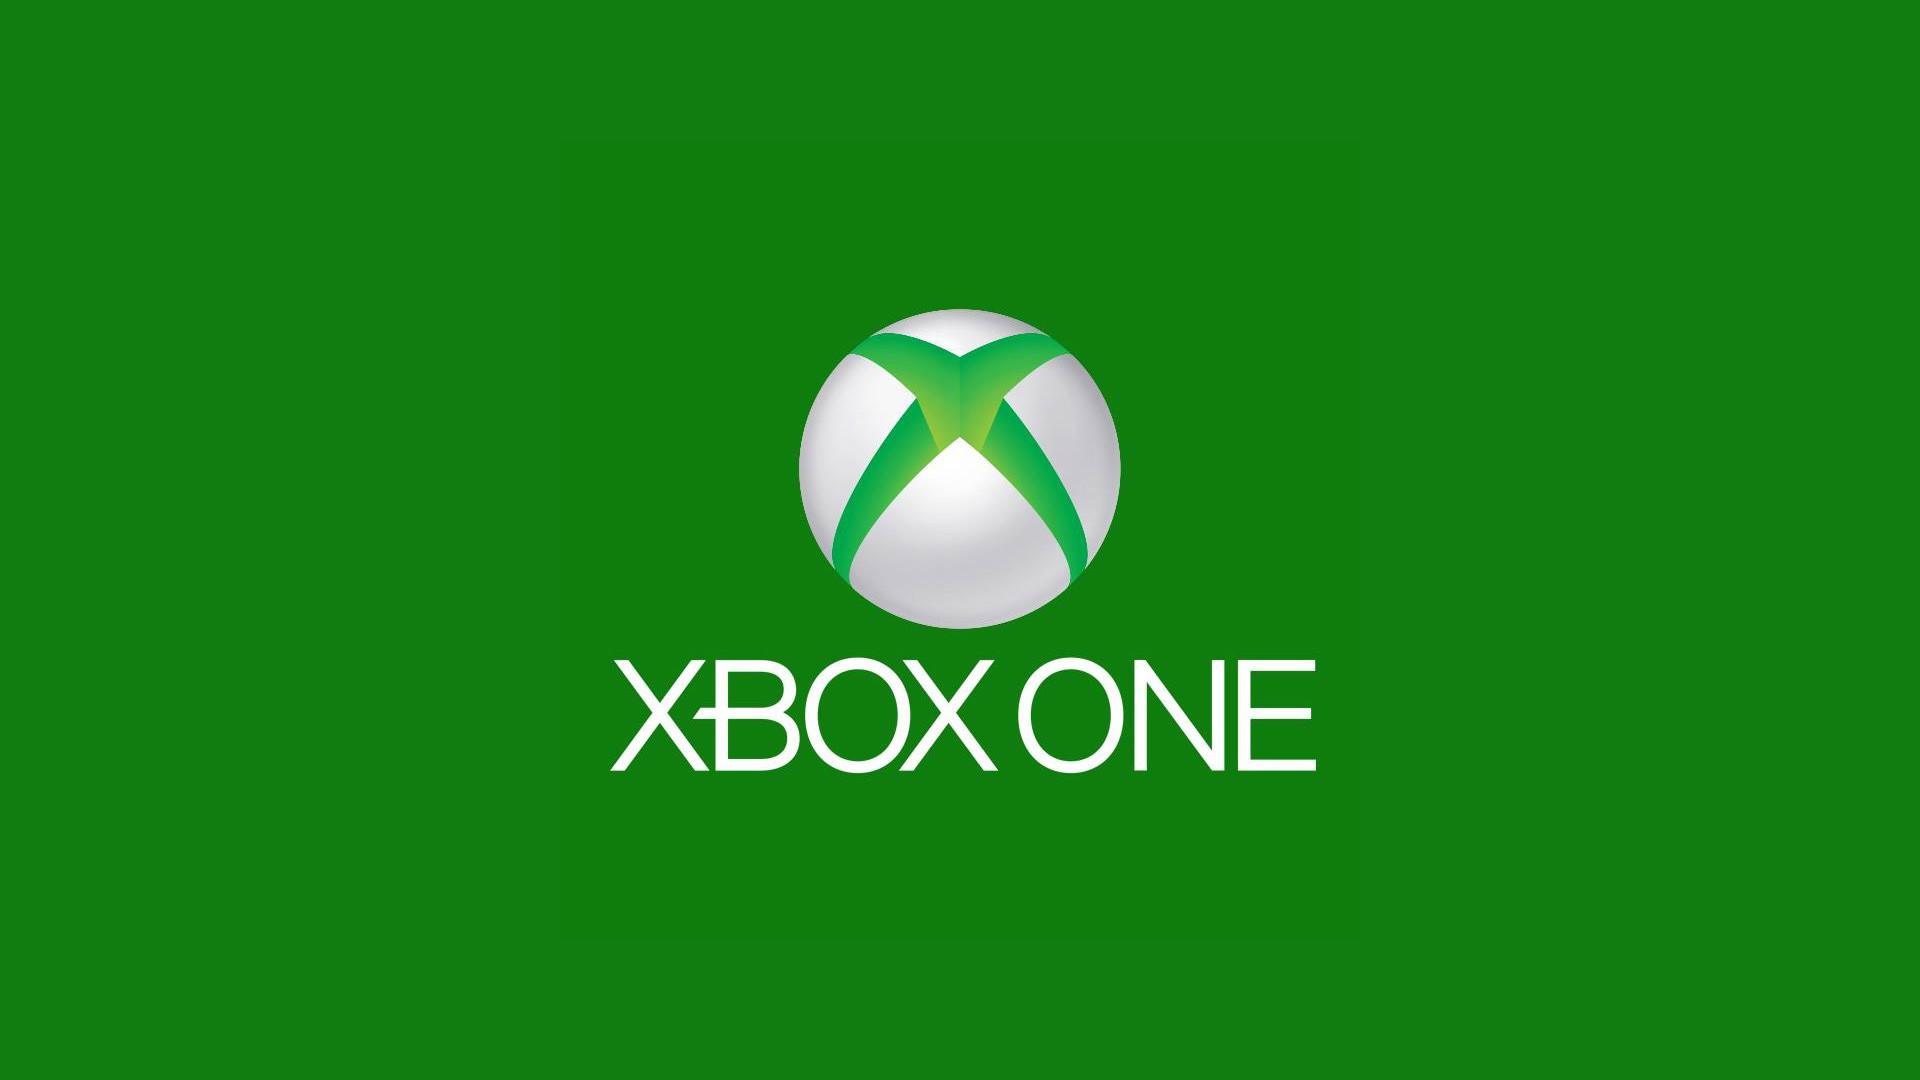 Xbox 360 Wallpaper Hd Wallpapertag